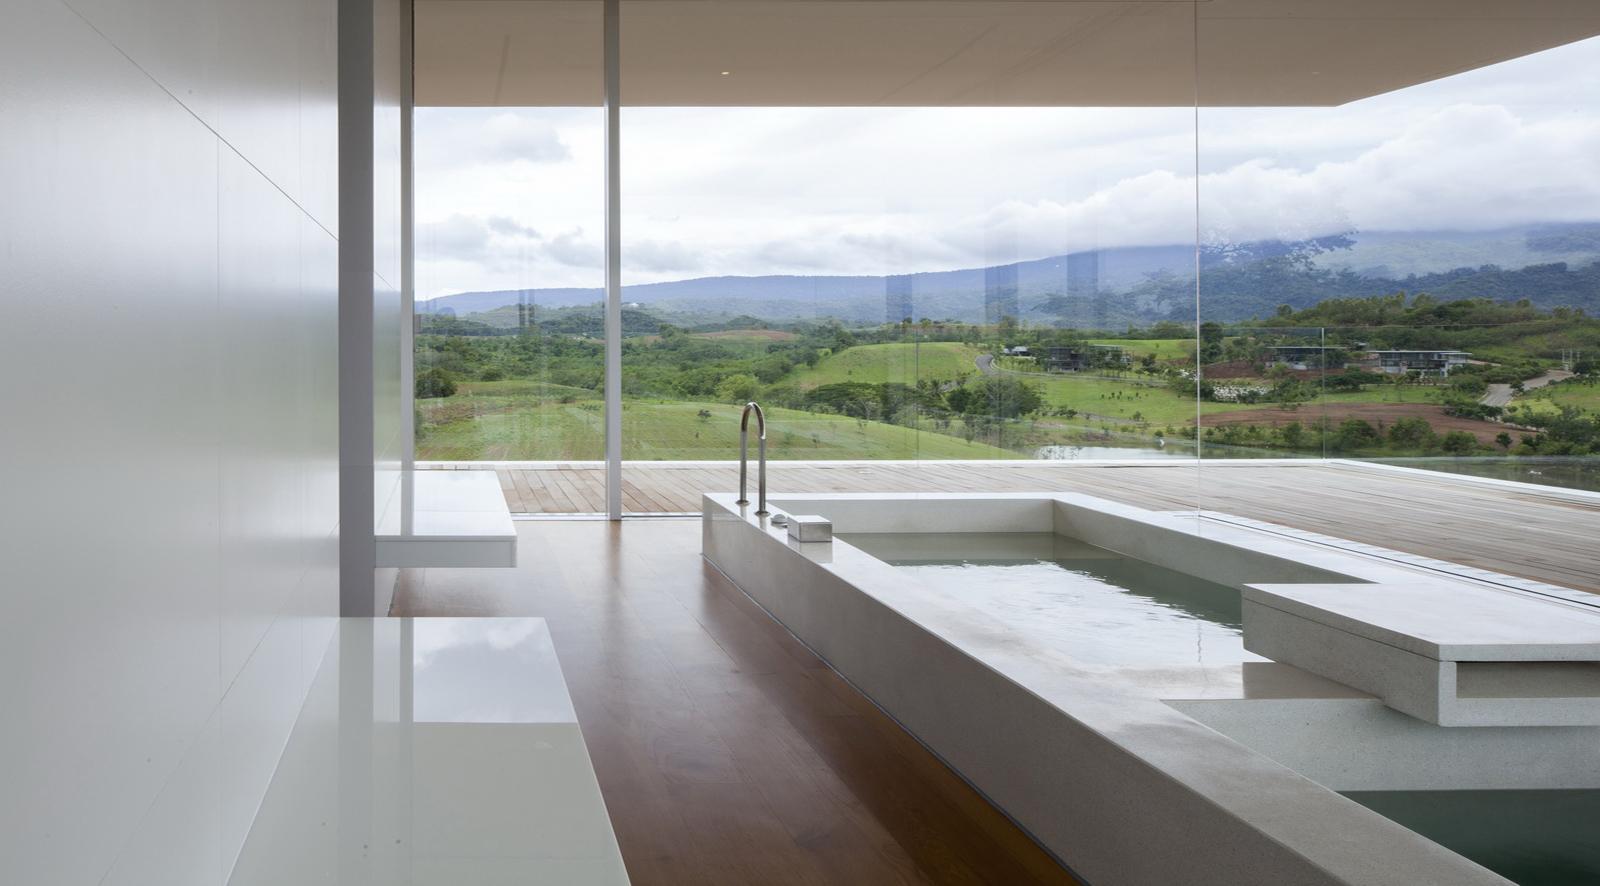 indoor pool interior design ideas. Black Bedroom Furniture Sets. Home Design Ideas